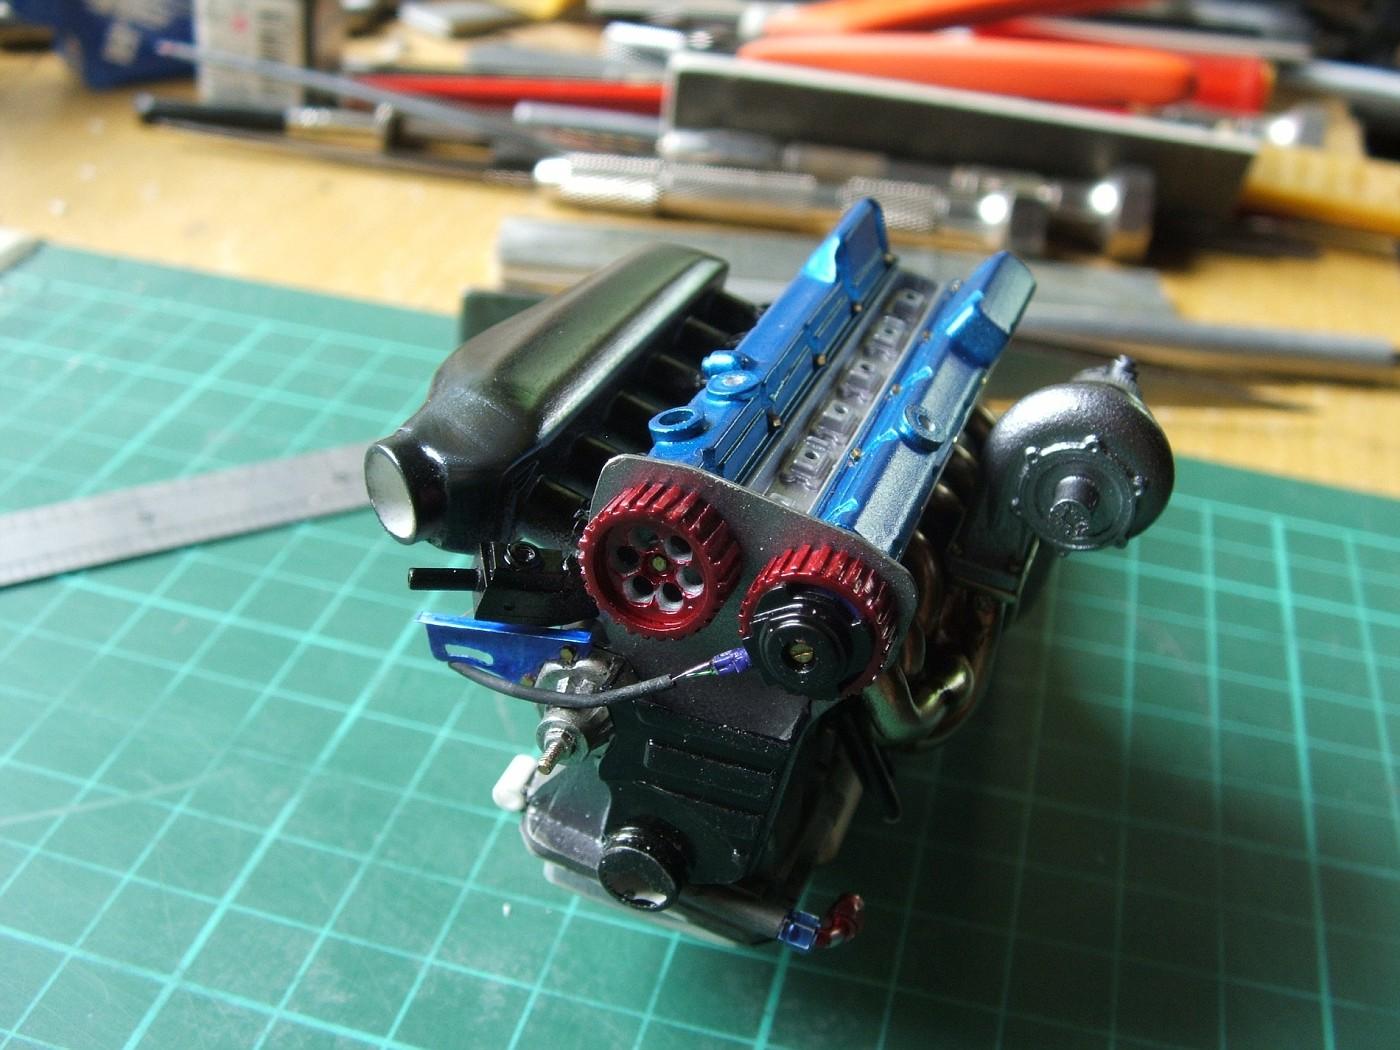 DSCF8843-vi.jpg